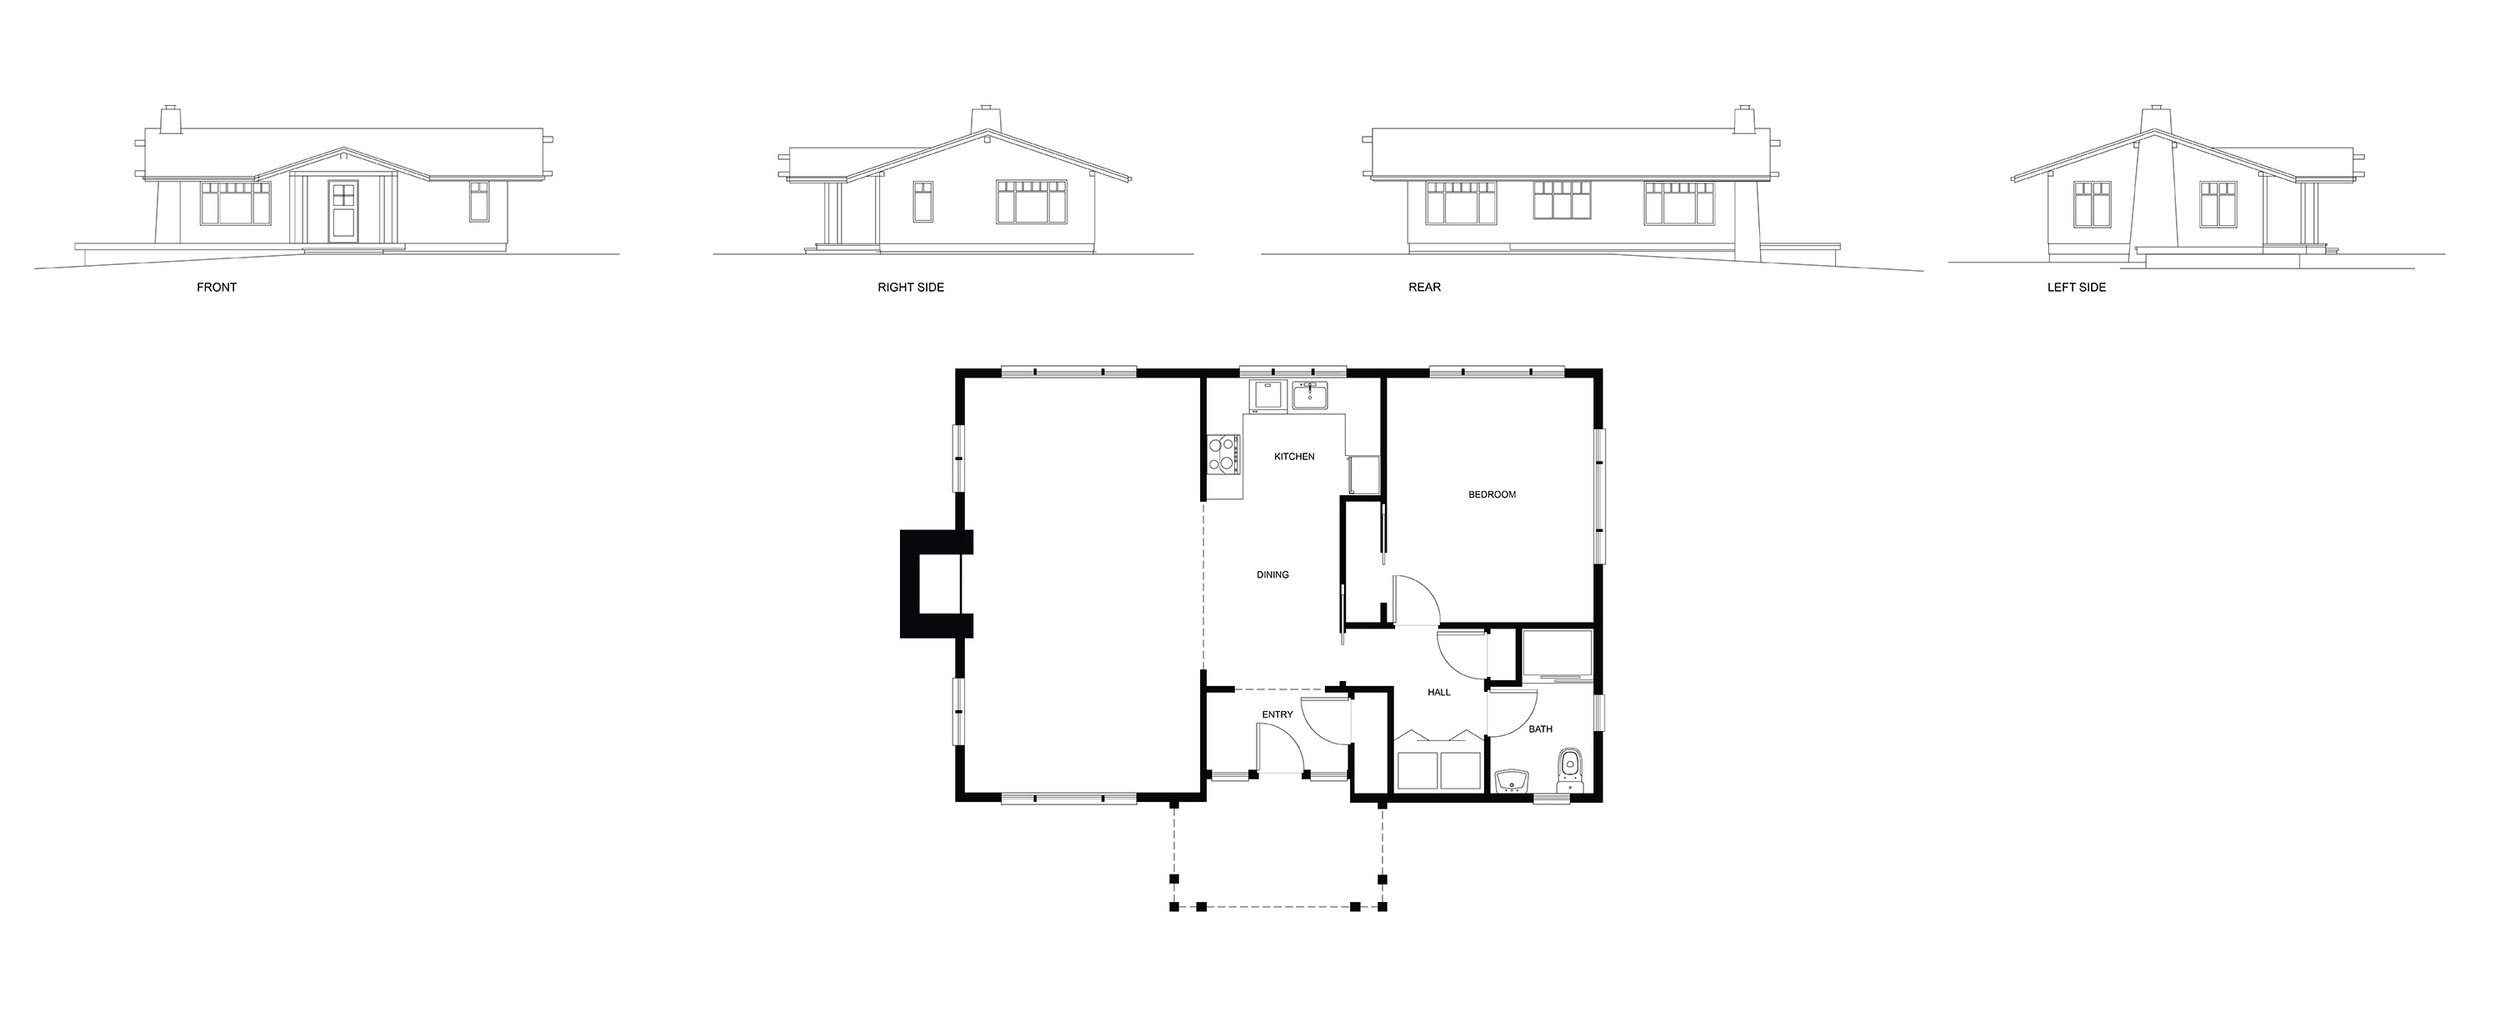 Guest House Elevations & Floorplan